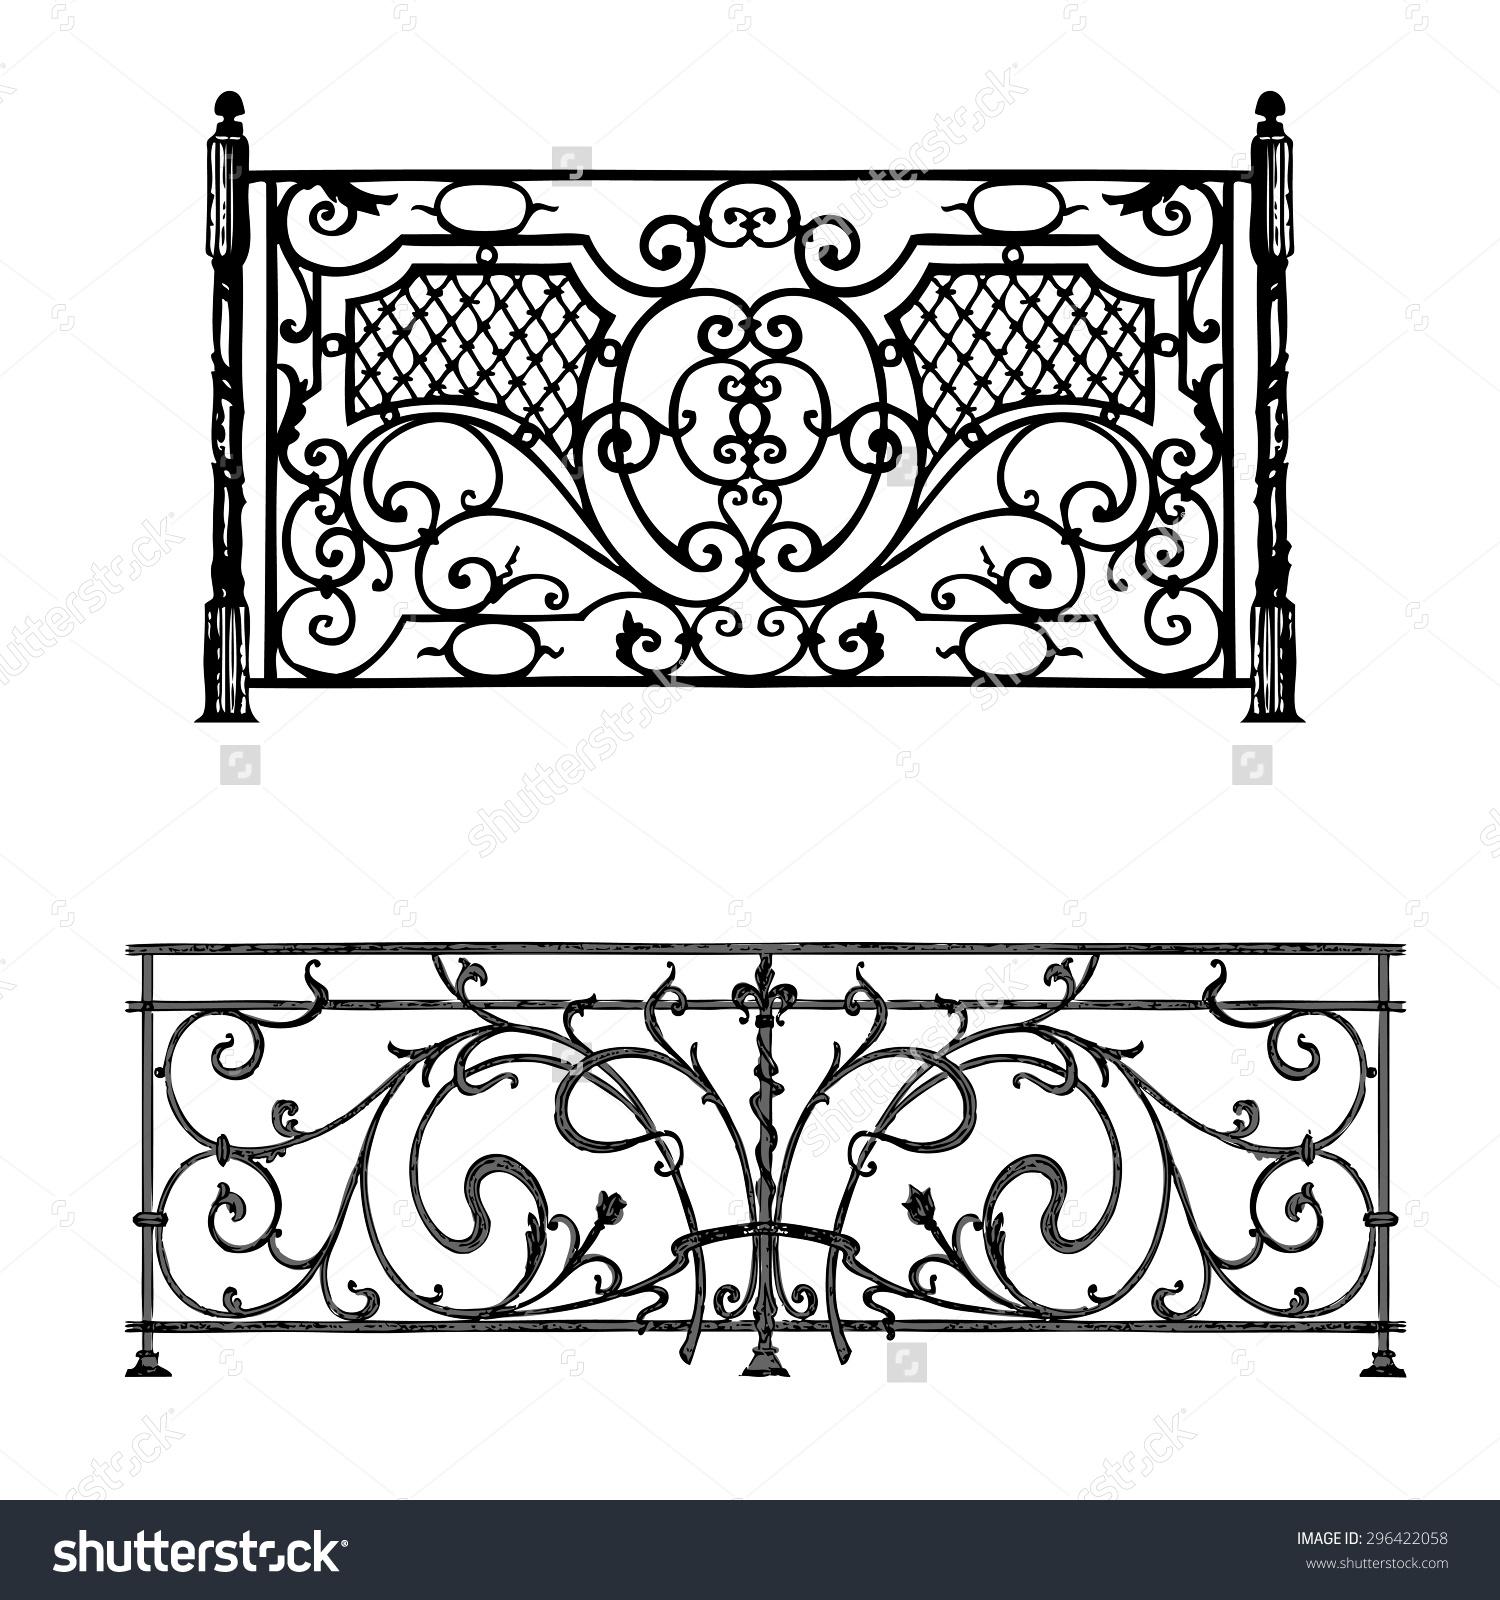 railing clipart